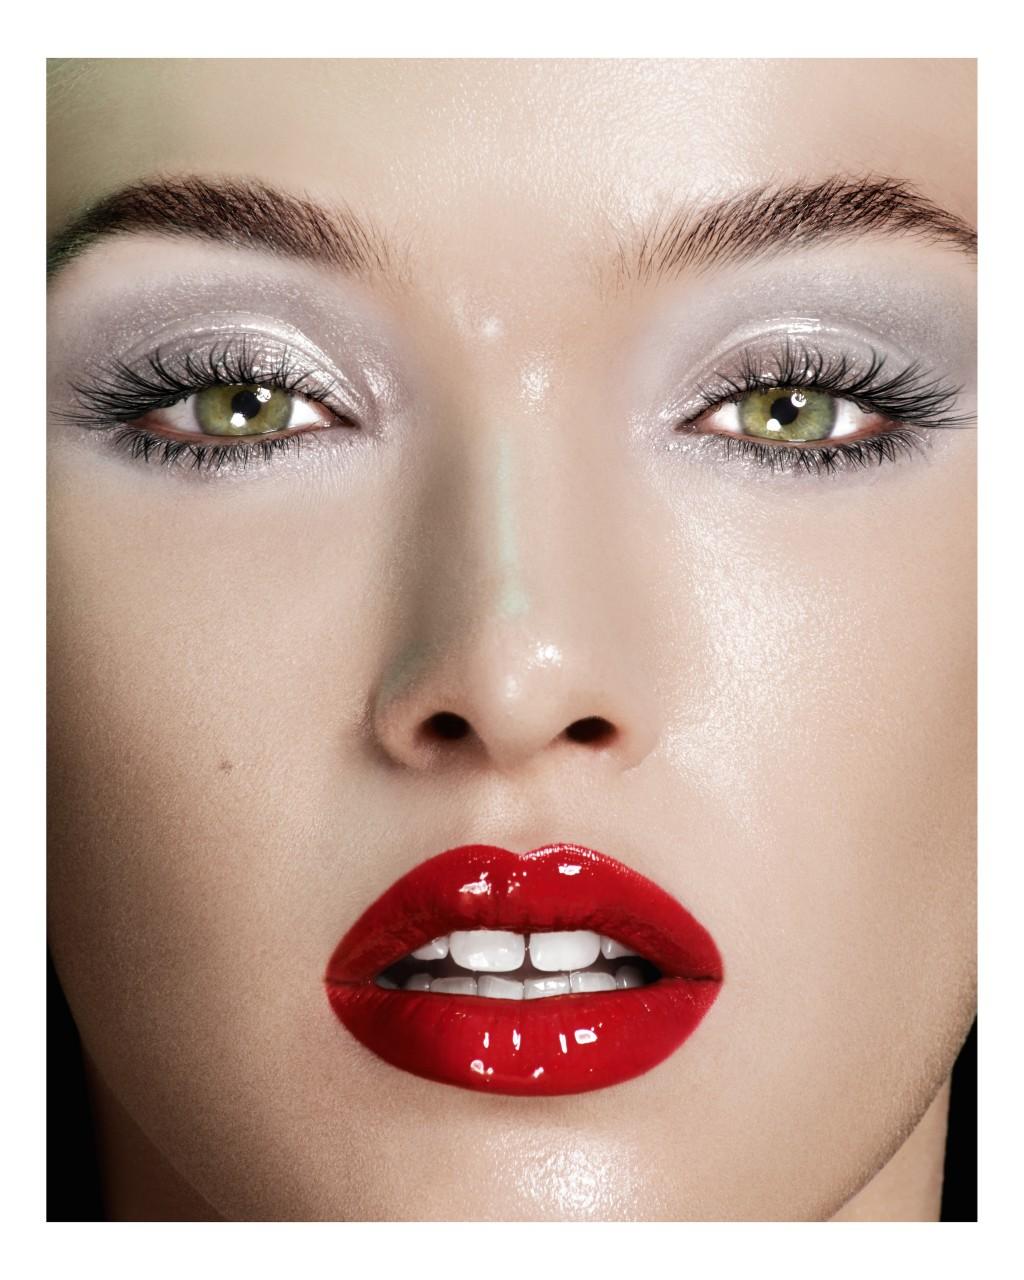 olga_shutieva_eugenio_qose_lara_navarrini_beauty